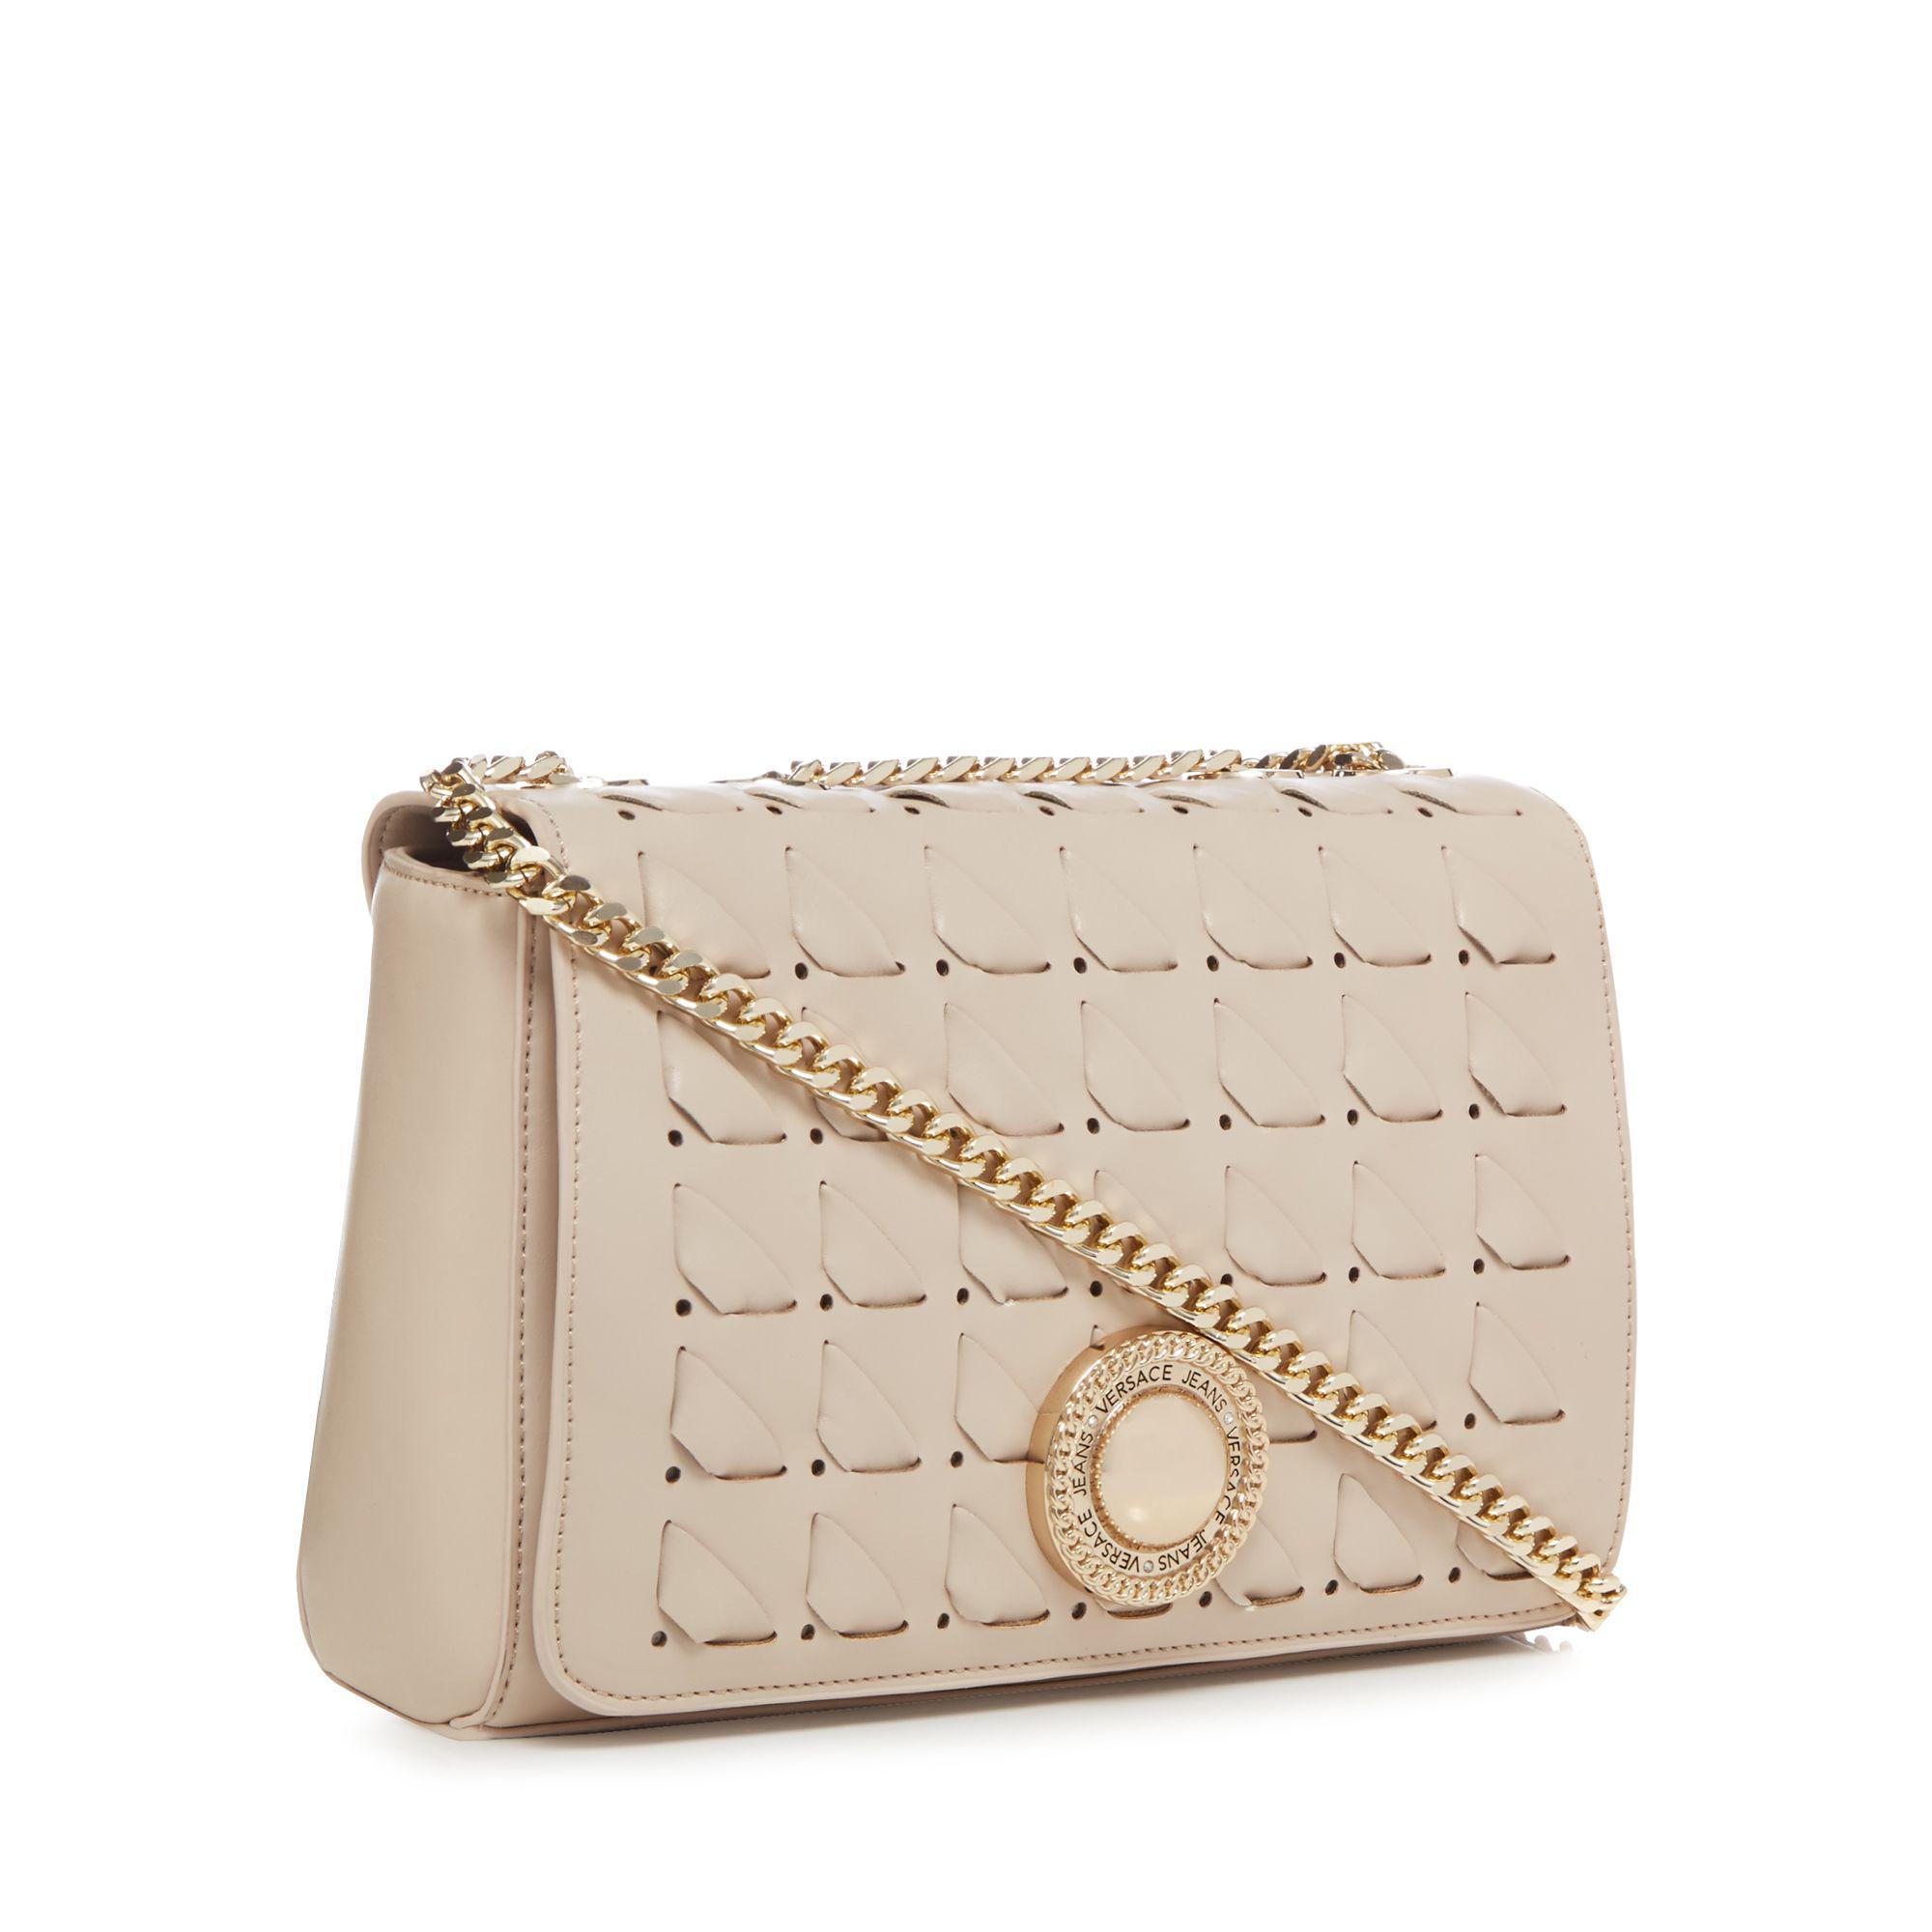 Versace Jeans Couture Denim Cream Interlace Cross Body Bag in Natural